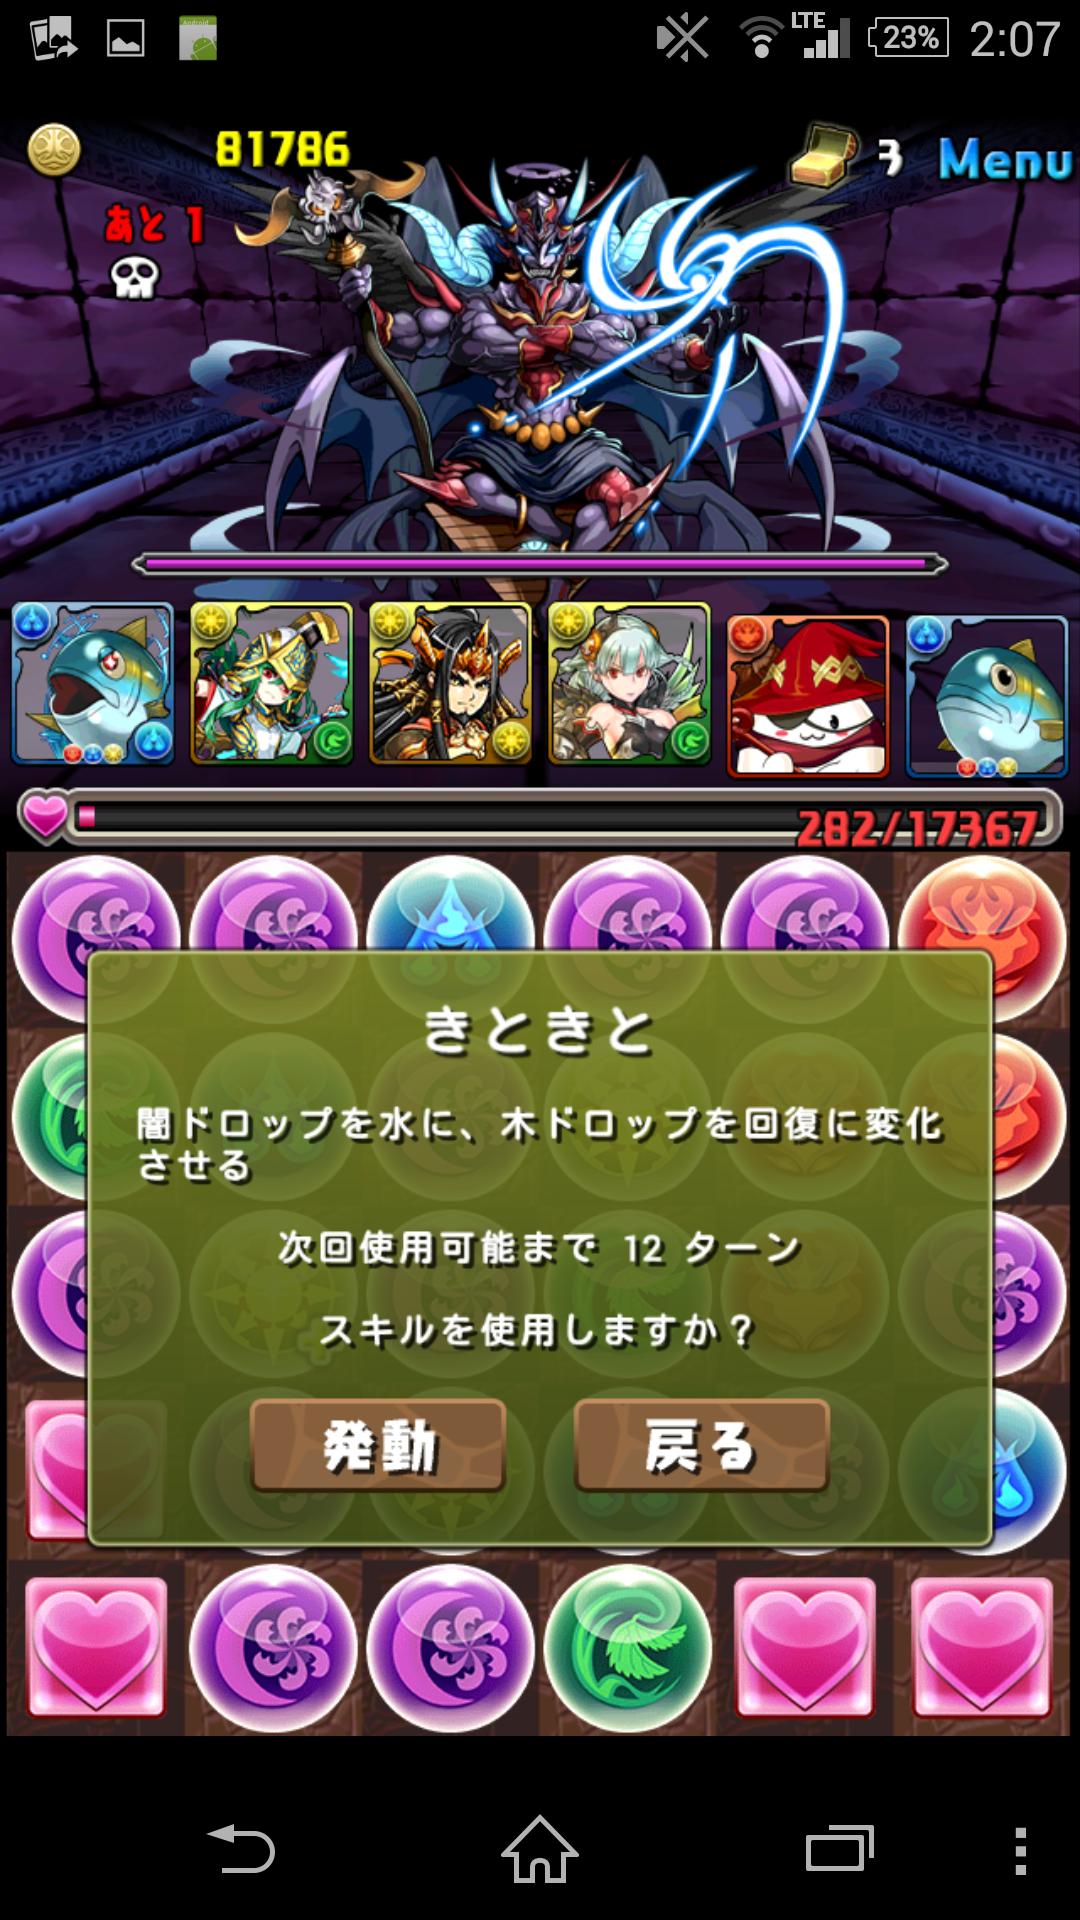 Screenshot_2014-09-30-02-07-43.png